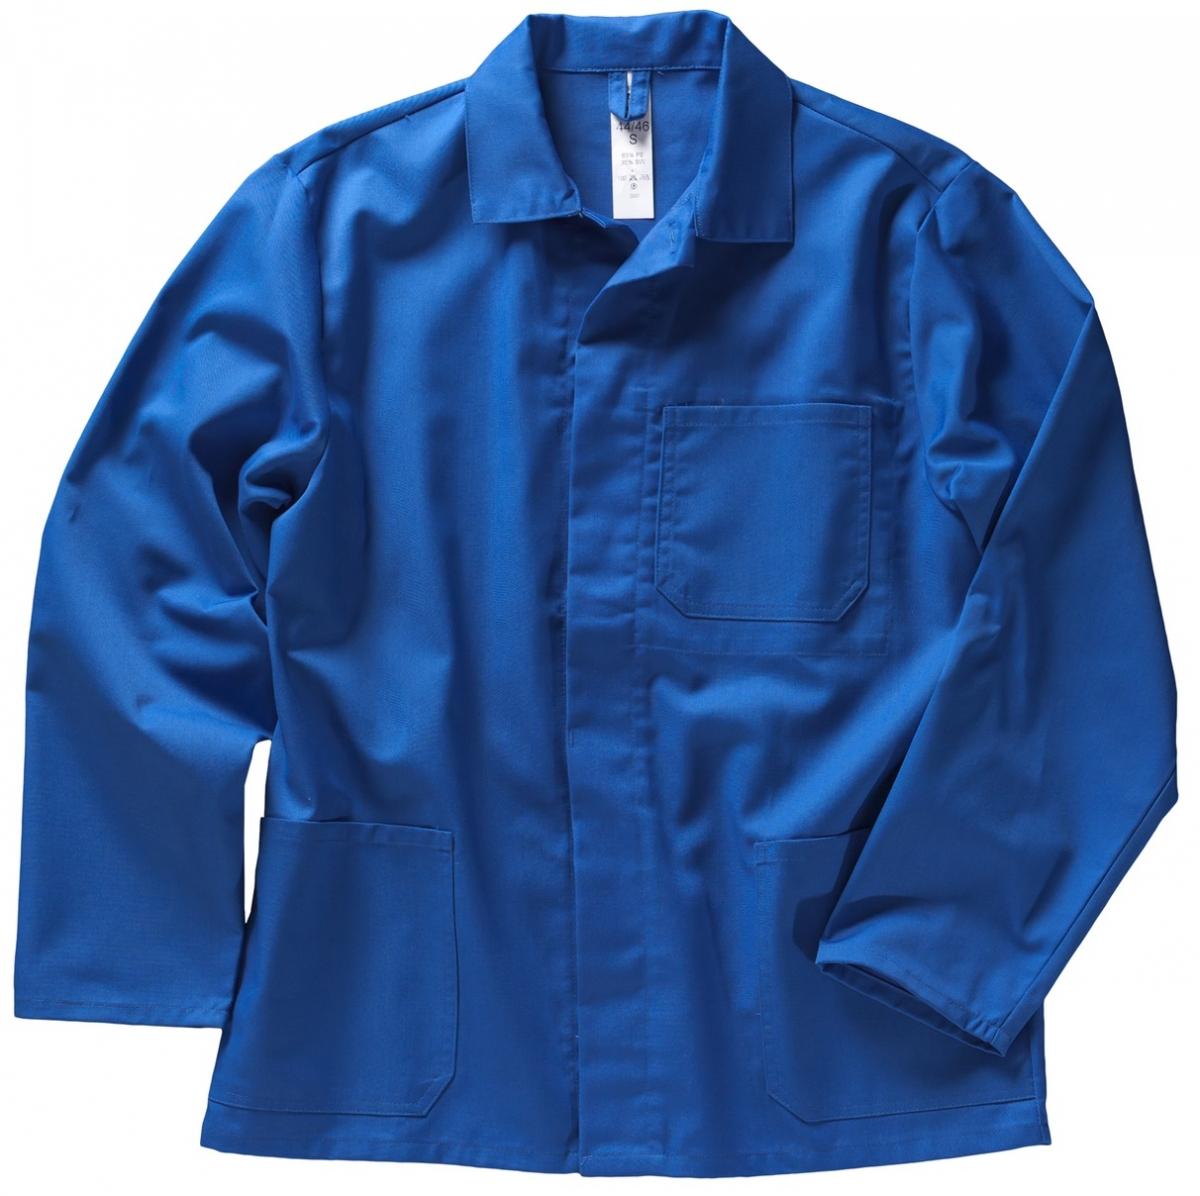 BEB-Arbeits-Berufs-Bund-Jacke, BW 320, kornblau